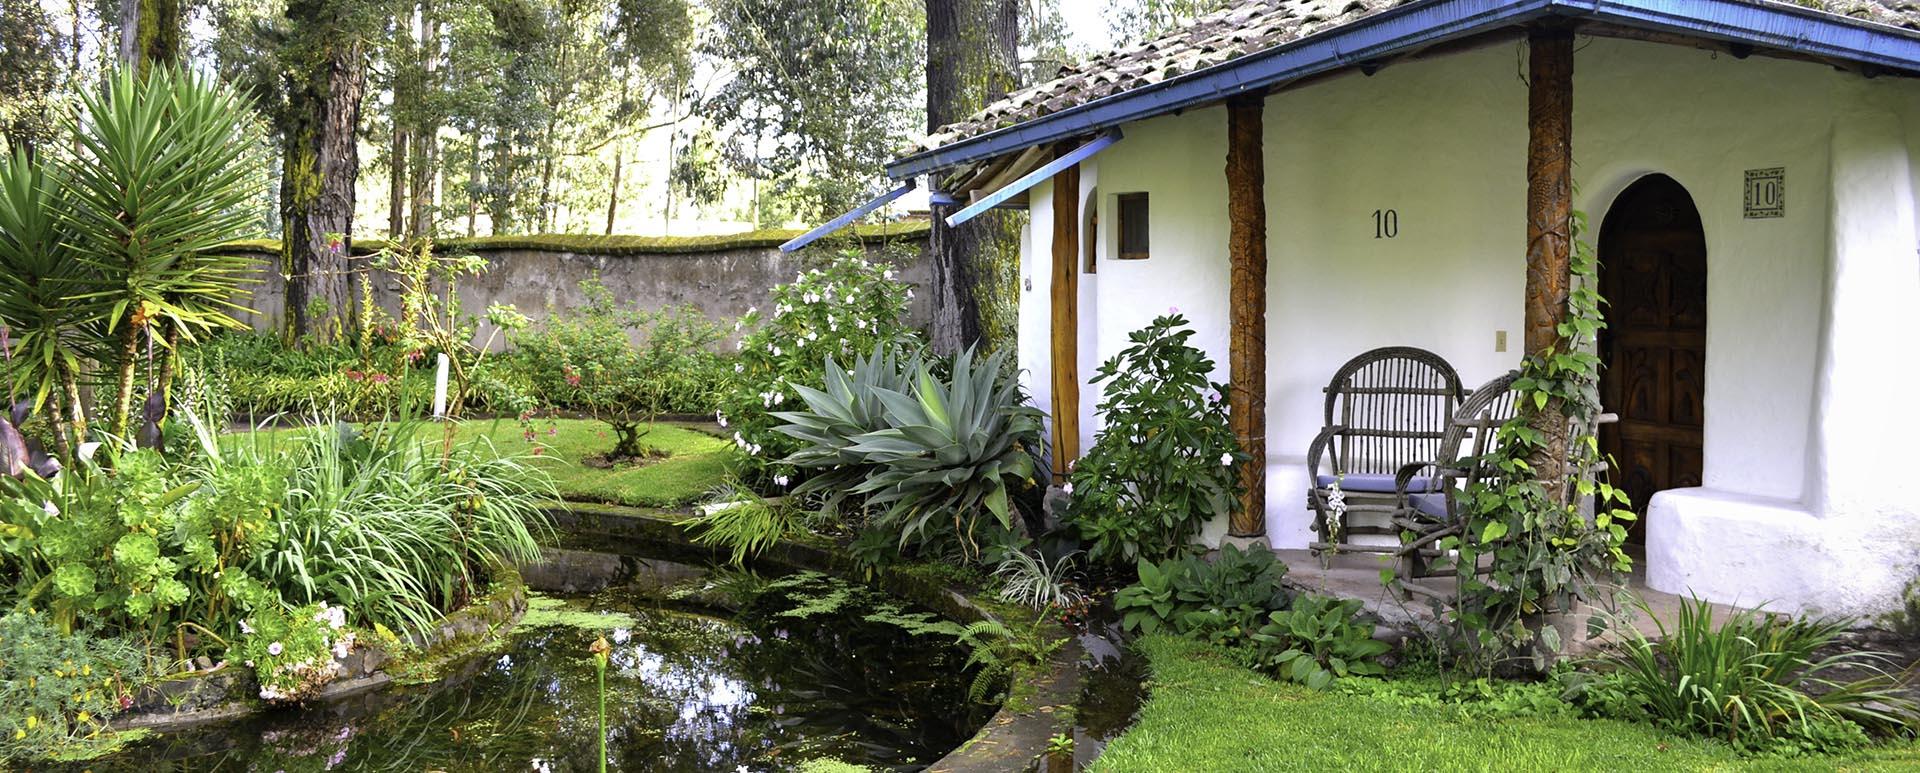 Hacienda Cusin Otavalo